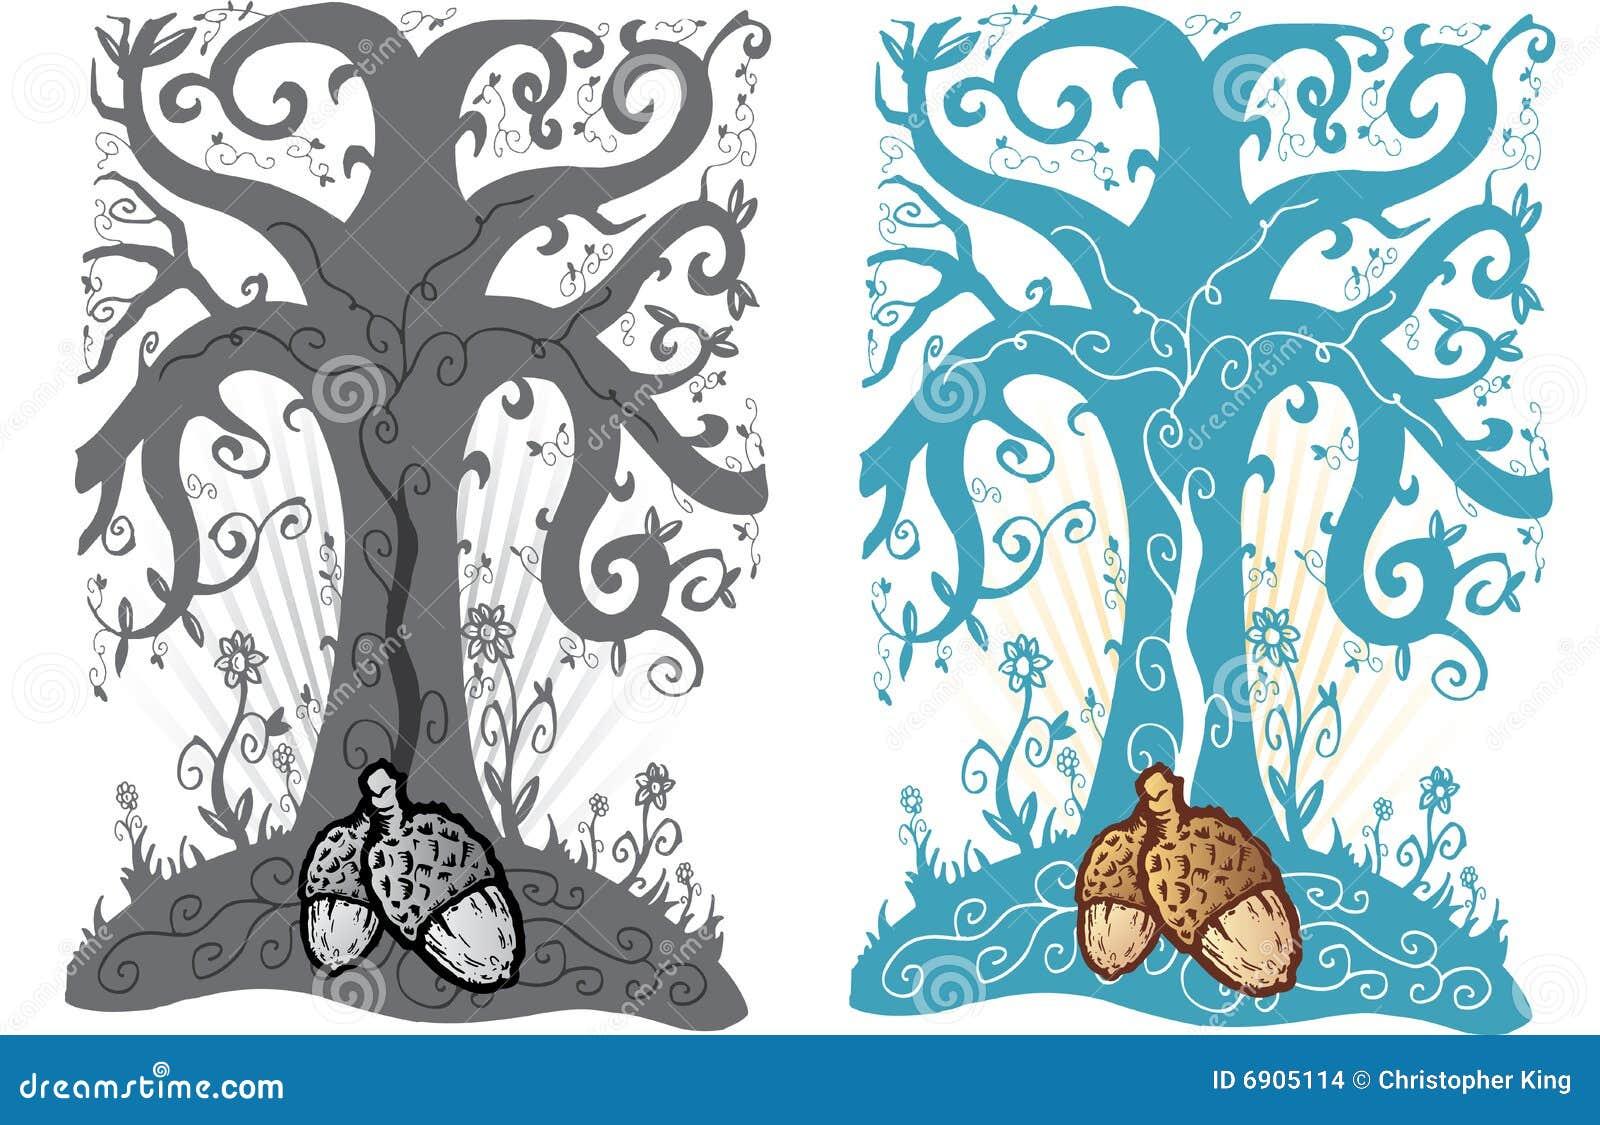 acorn and tree of life tattoo style illustration stock. Black Bedroom Furniture Sets. Home Design Ideas